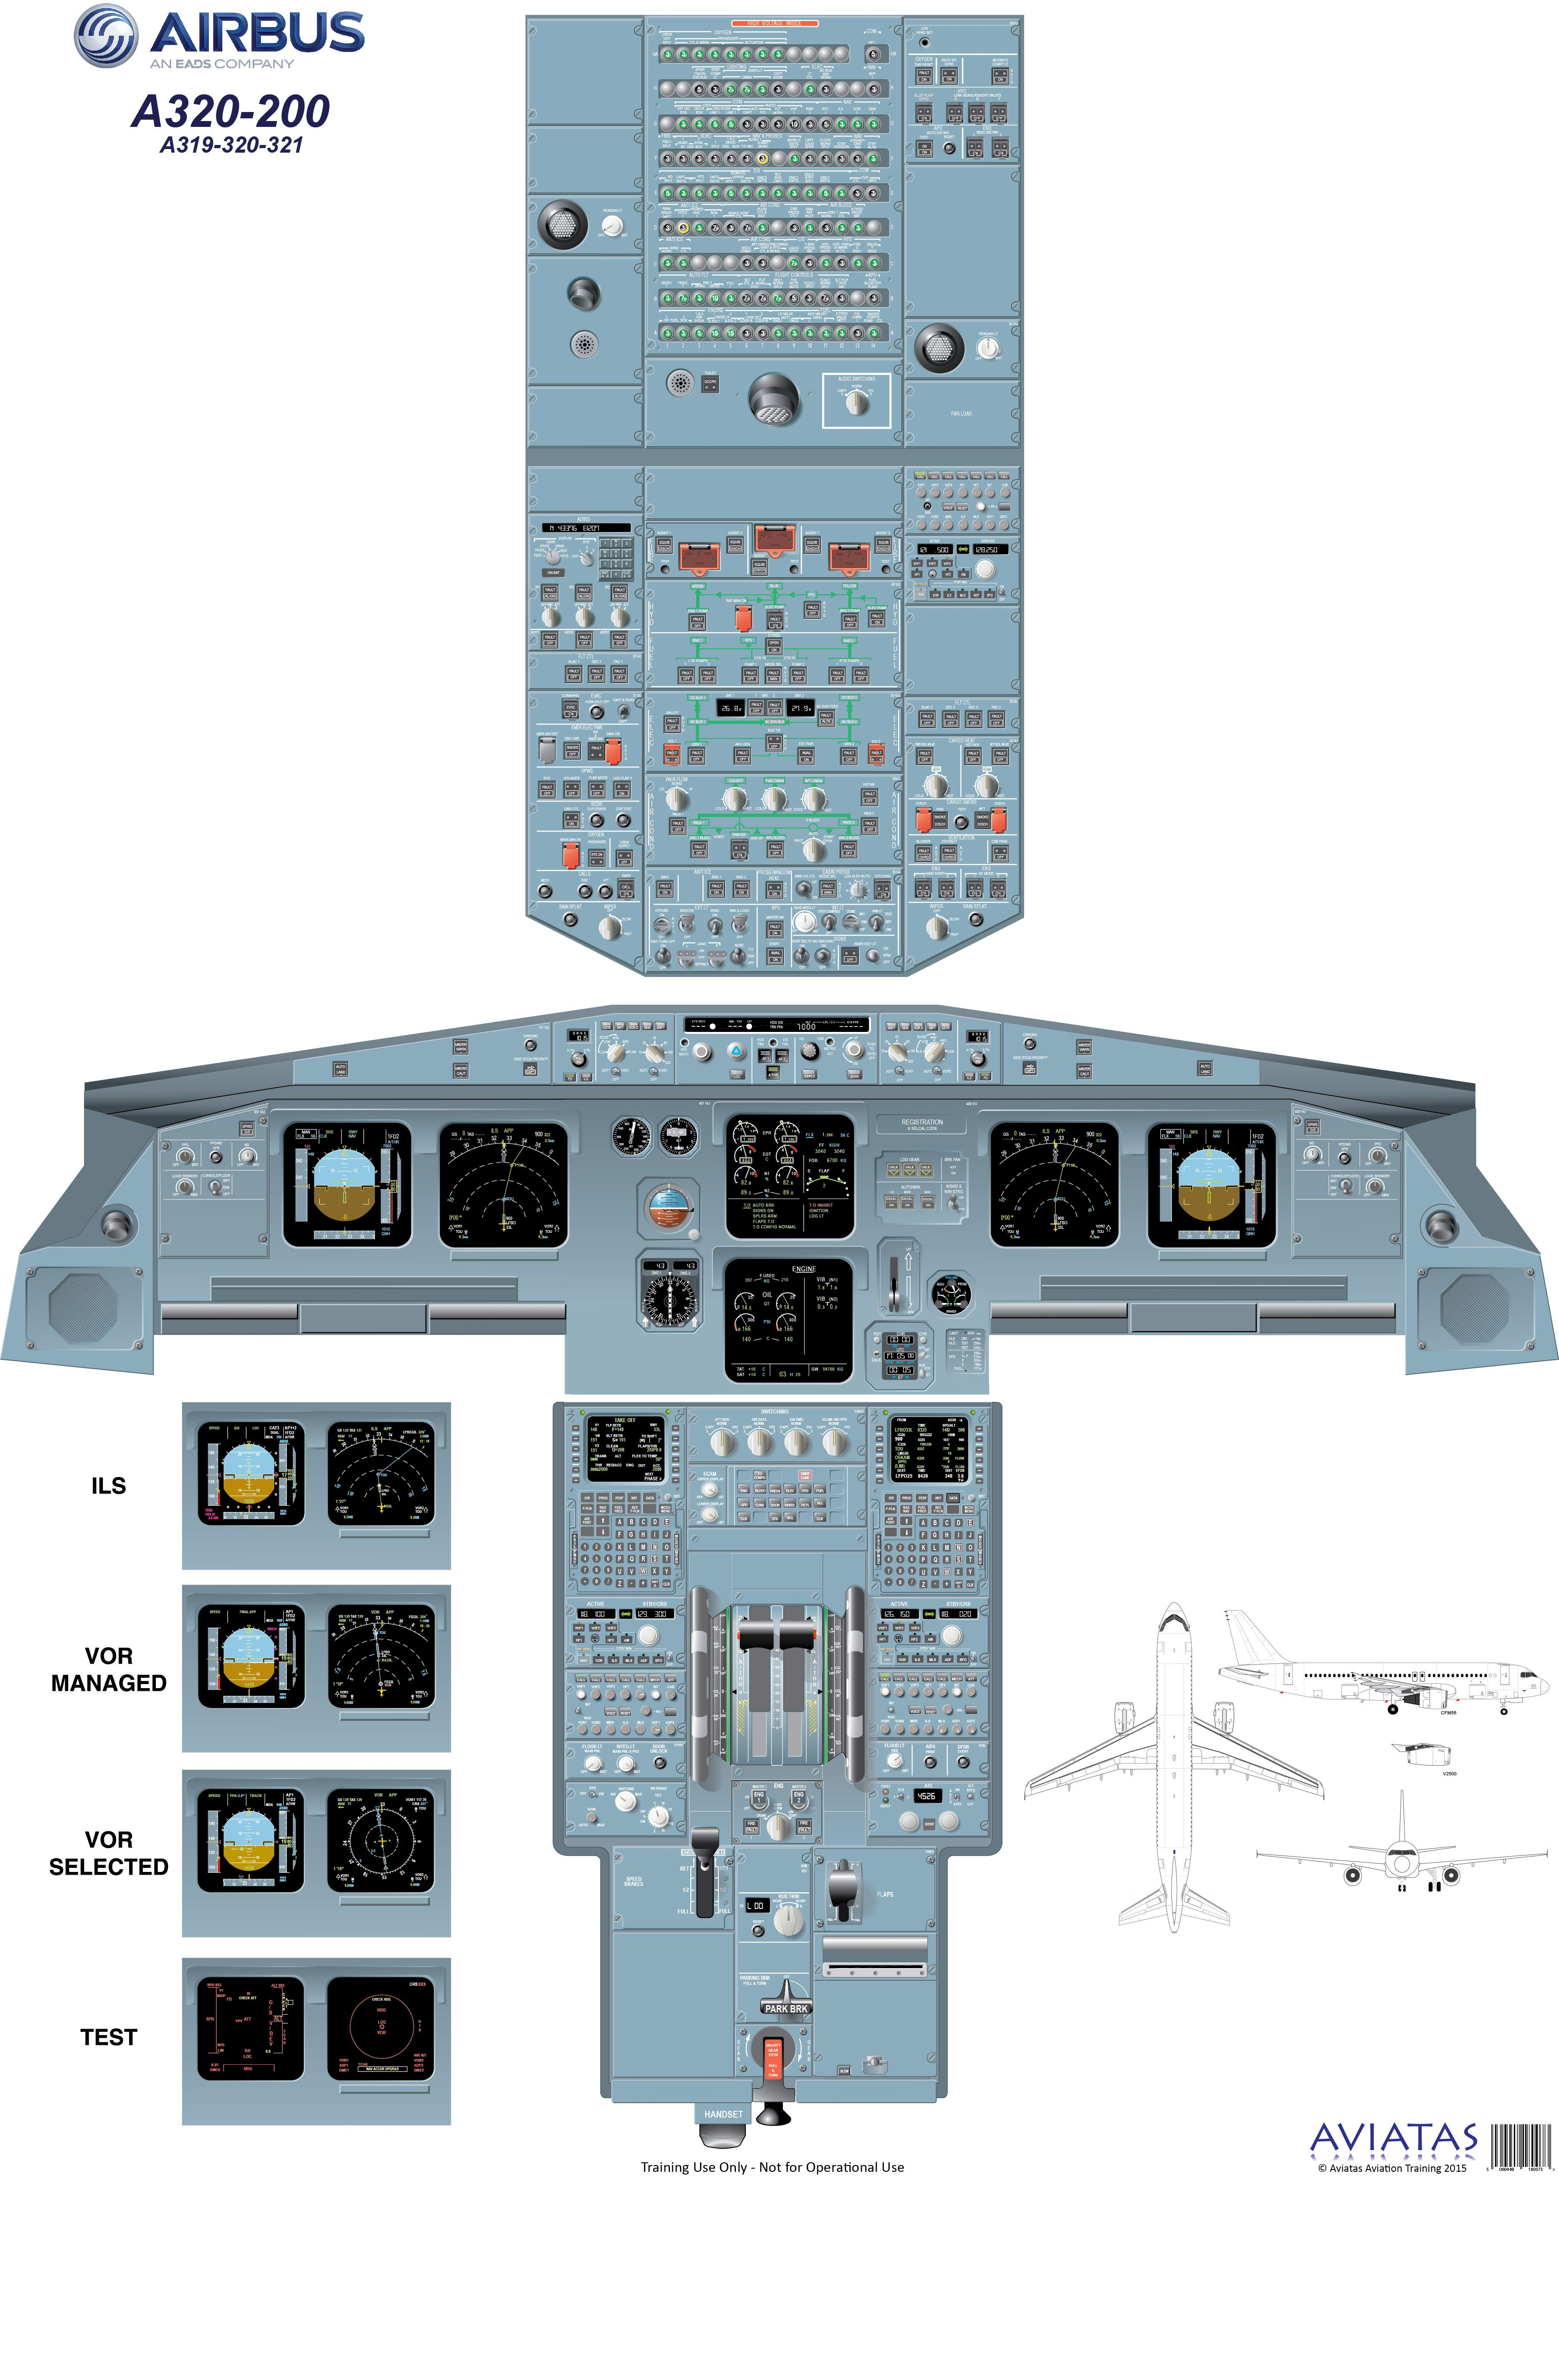 boeing 737 flight manual pdf